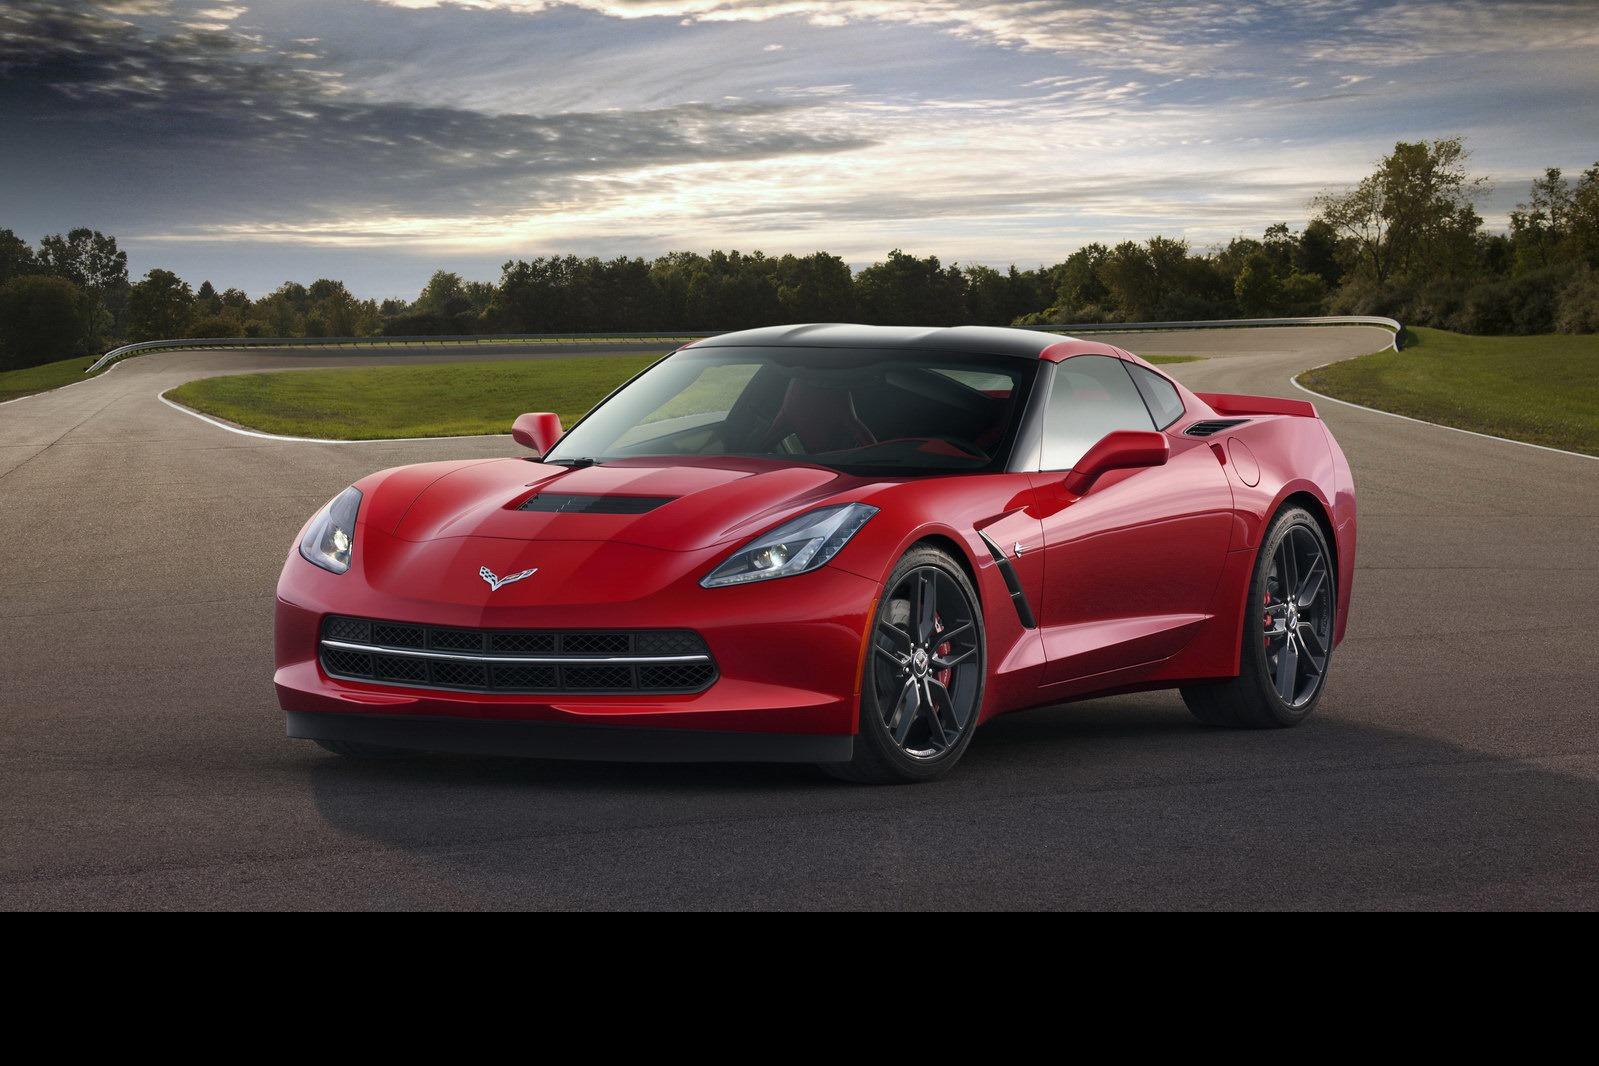 chevrolet launches 2014 corvette c7 stingray advertisement video. Black Bedroom Furniture Sets. Home Design Ideas